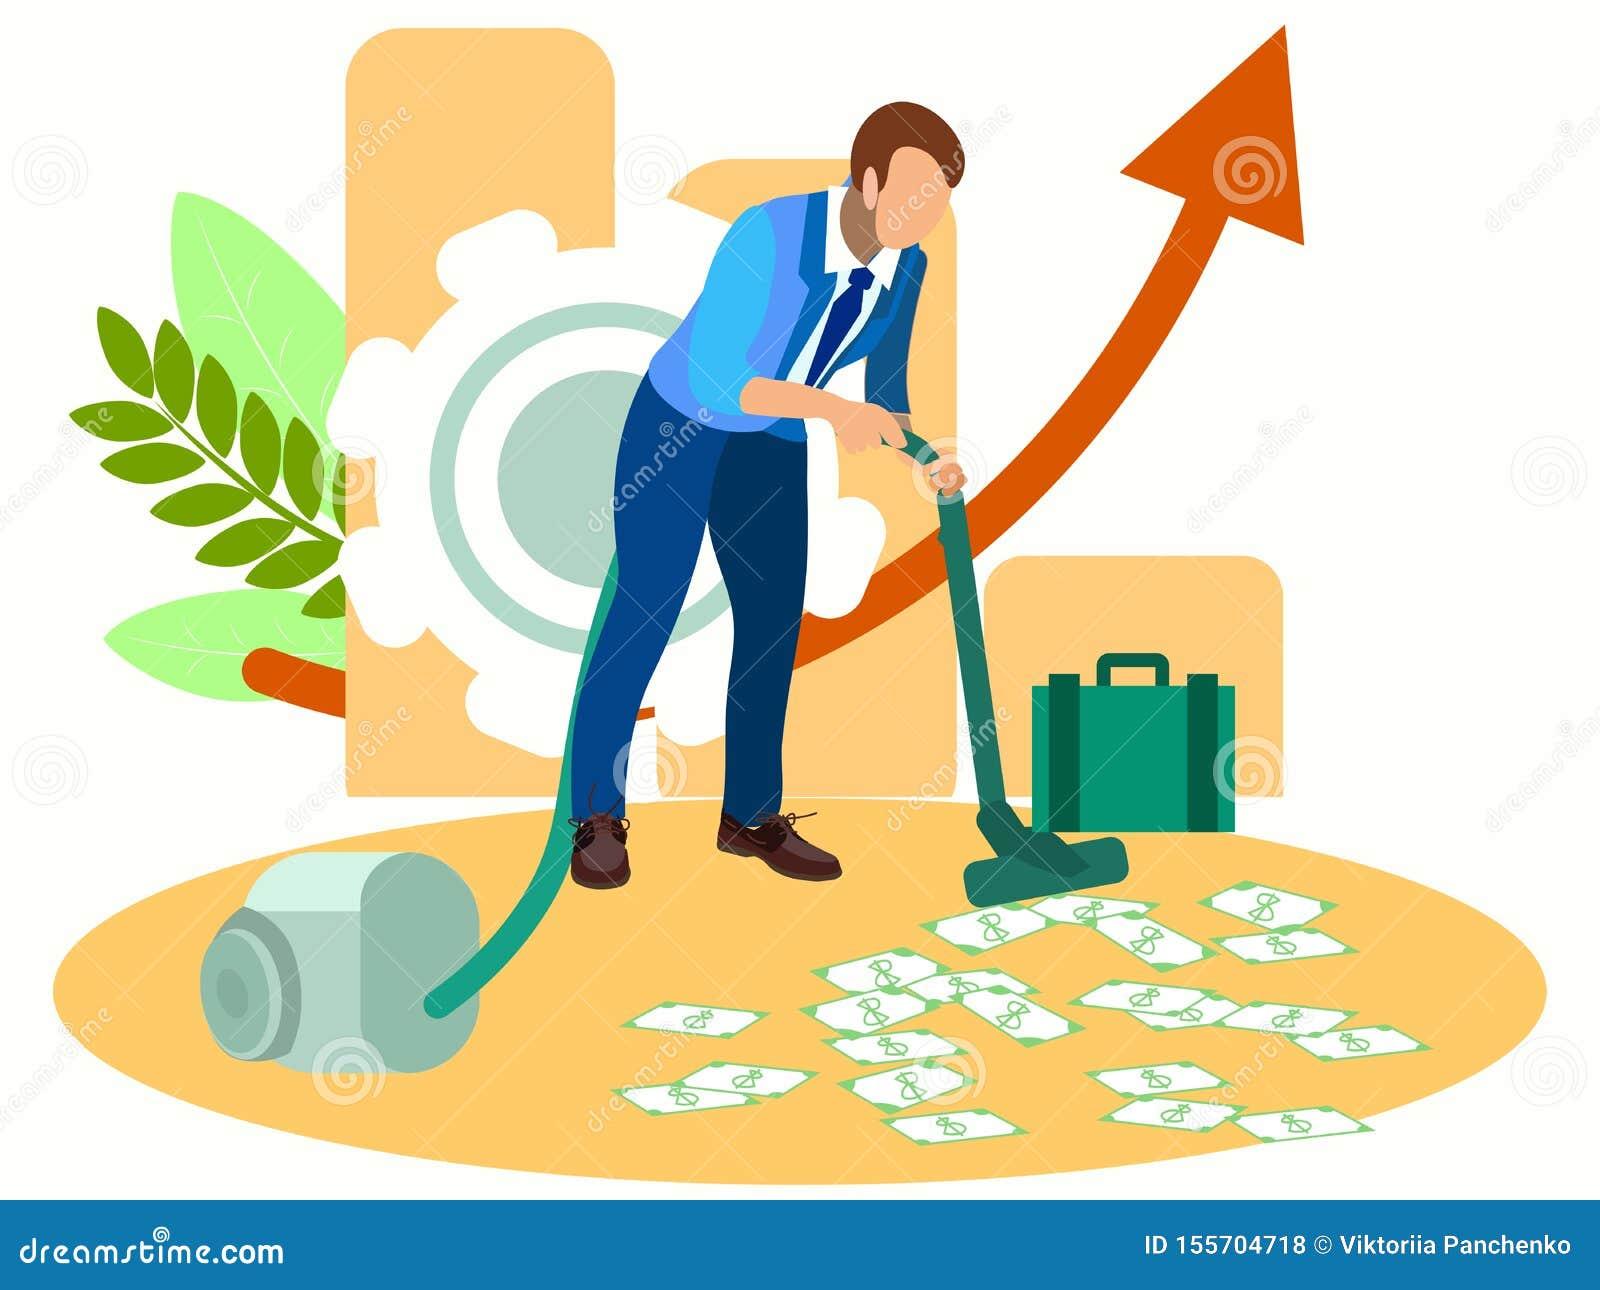 Man vacuuming money. In minimalist style Cartoon flat raster